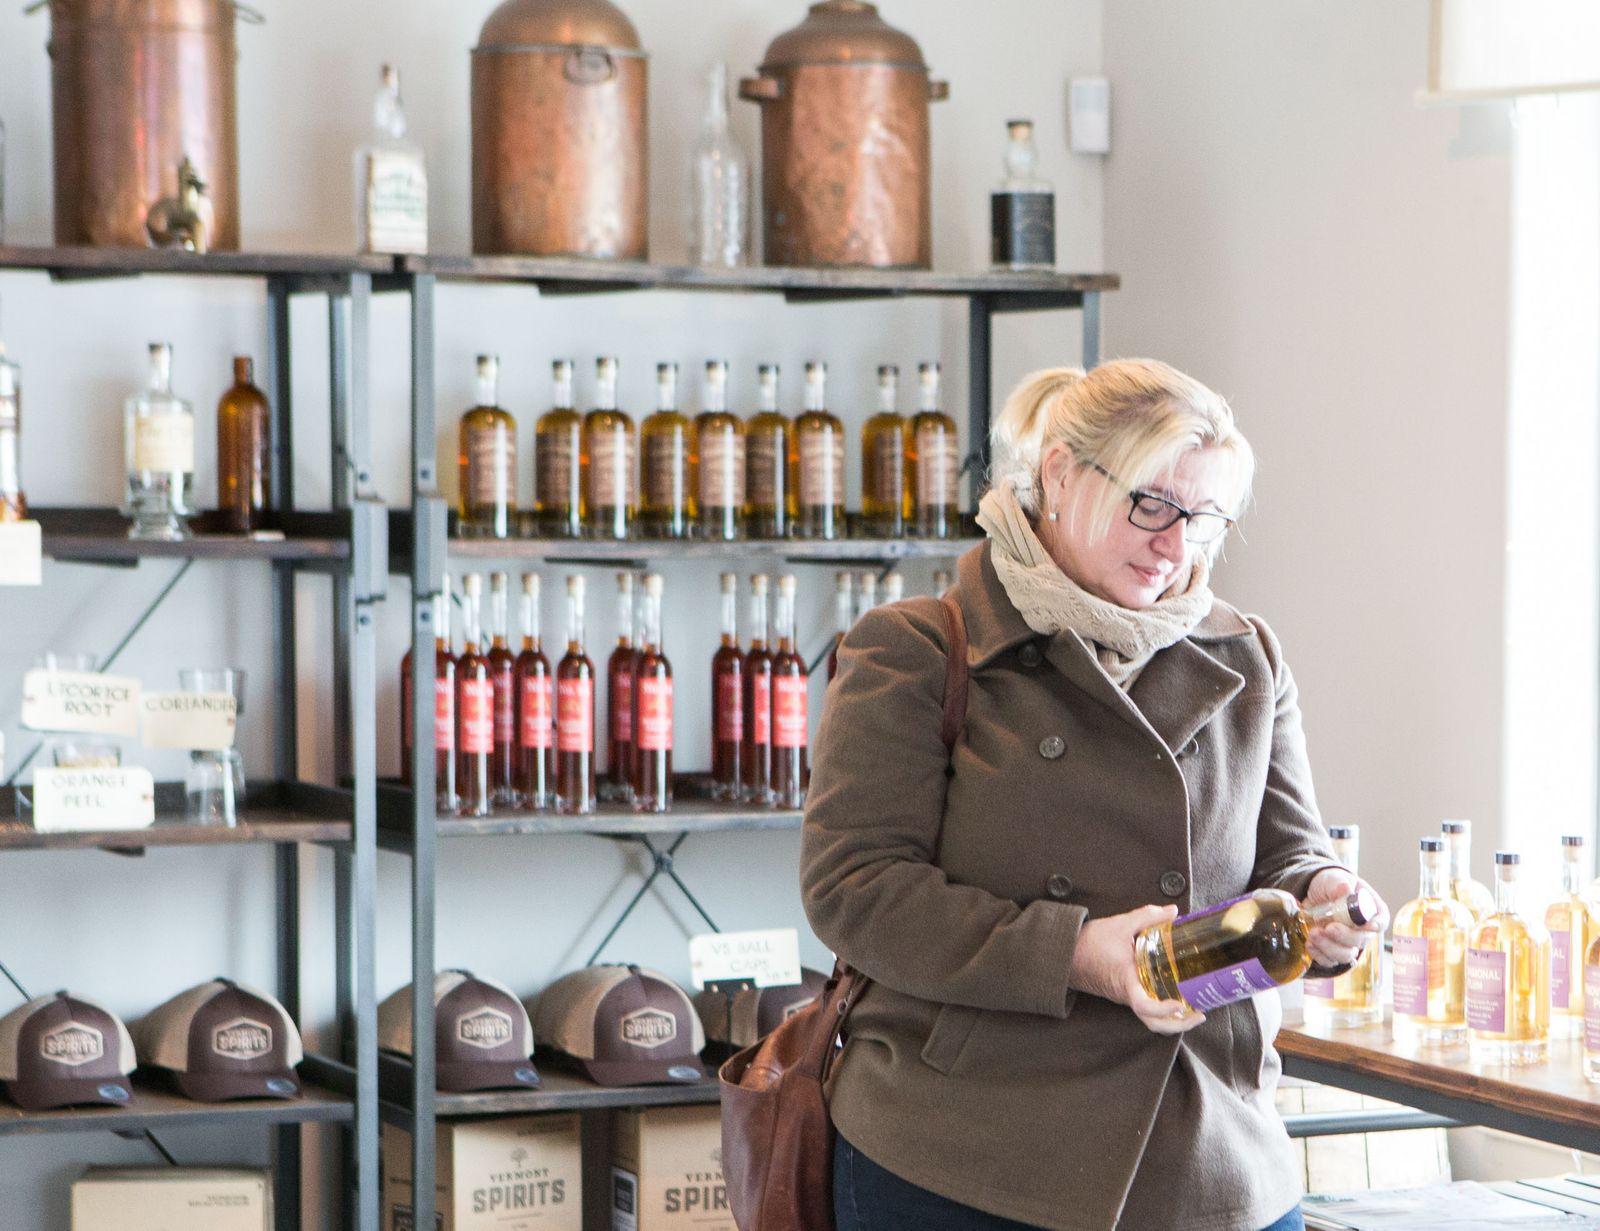 Vermont Spirits Distilling Co.